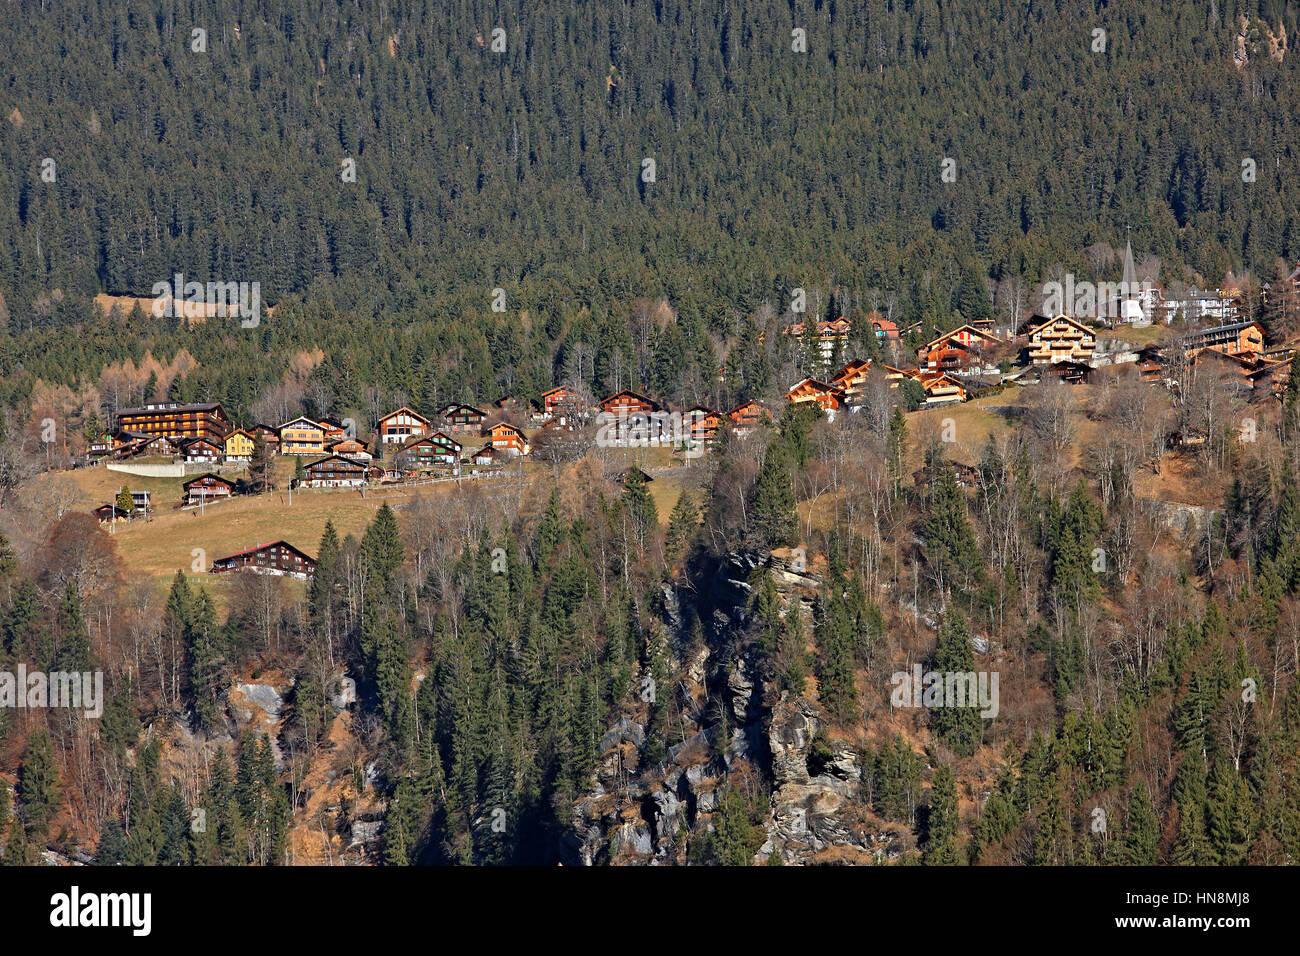 Wengen, a Swiss Alpine village in the Bernese Oberland region. It overlooks the Lauterbrunnen valley, Switzerland. - Stock Image